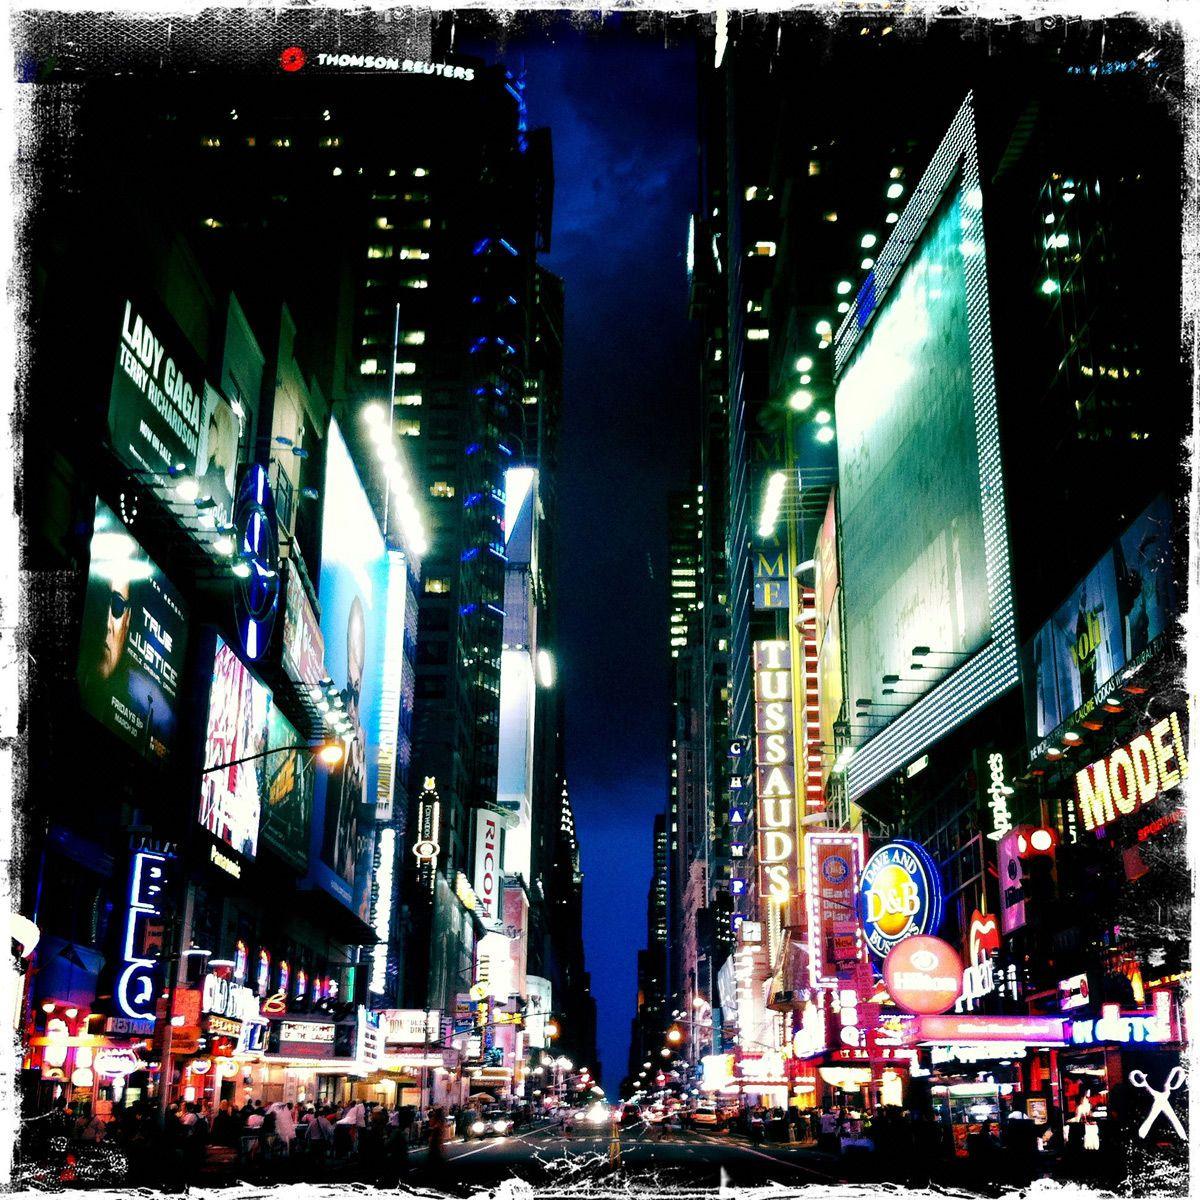 1r42nd_street_at_night